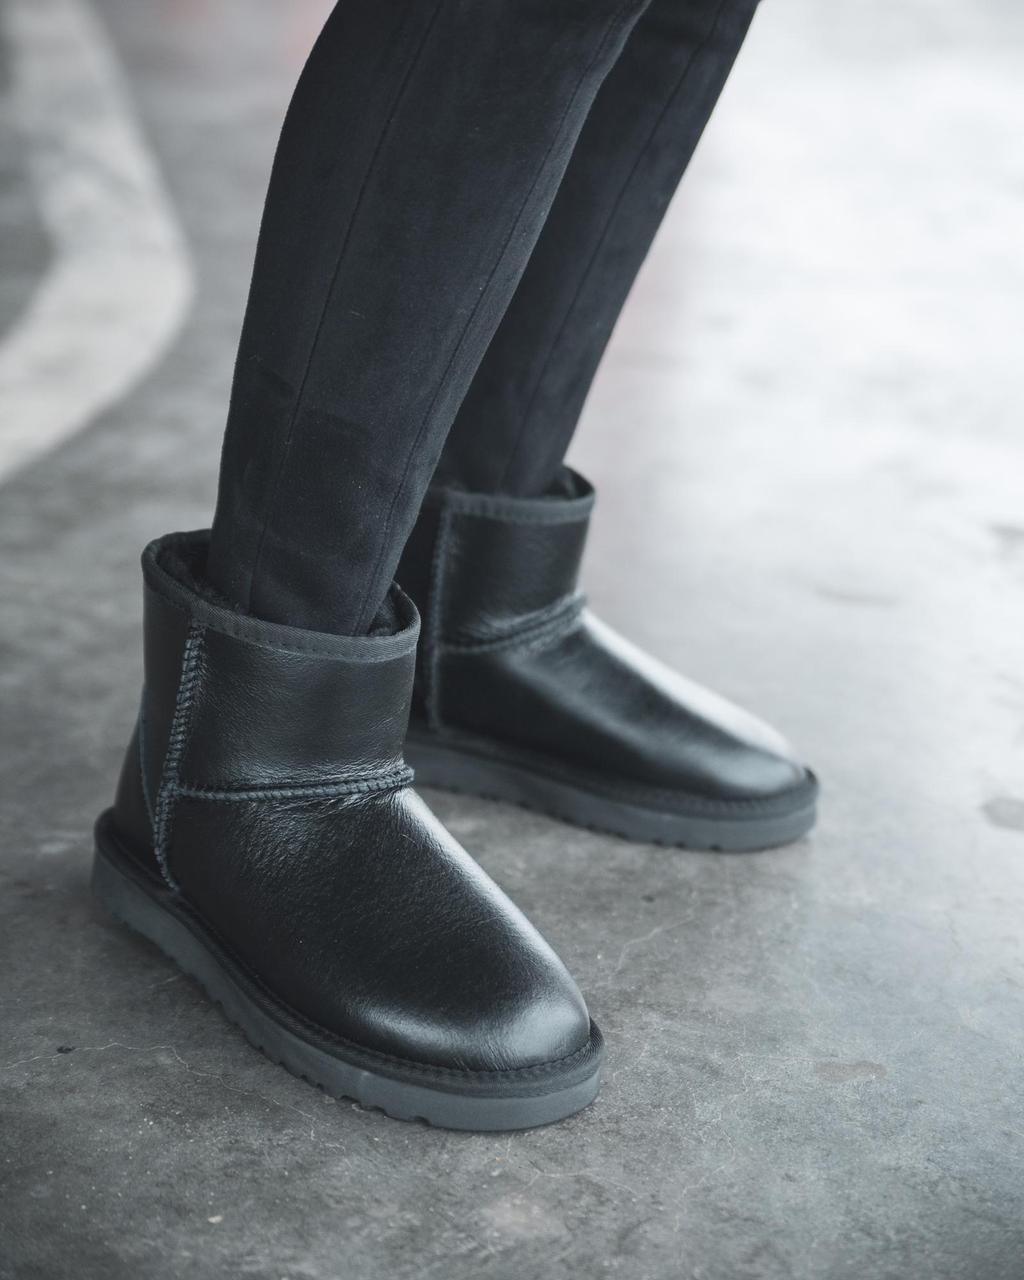 Ugg Classic Mini Black Leather